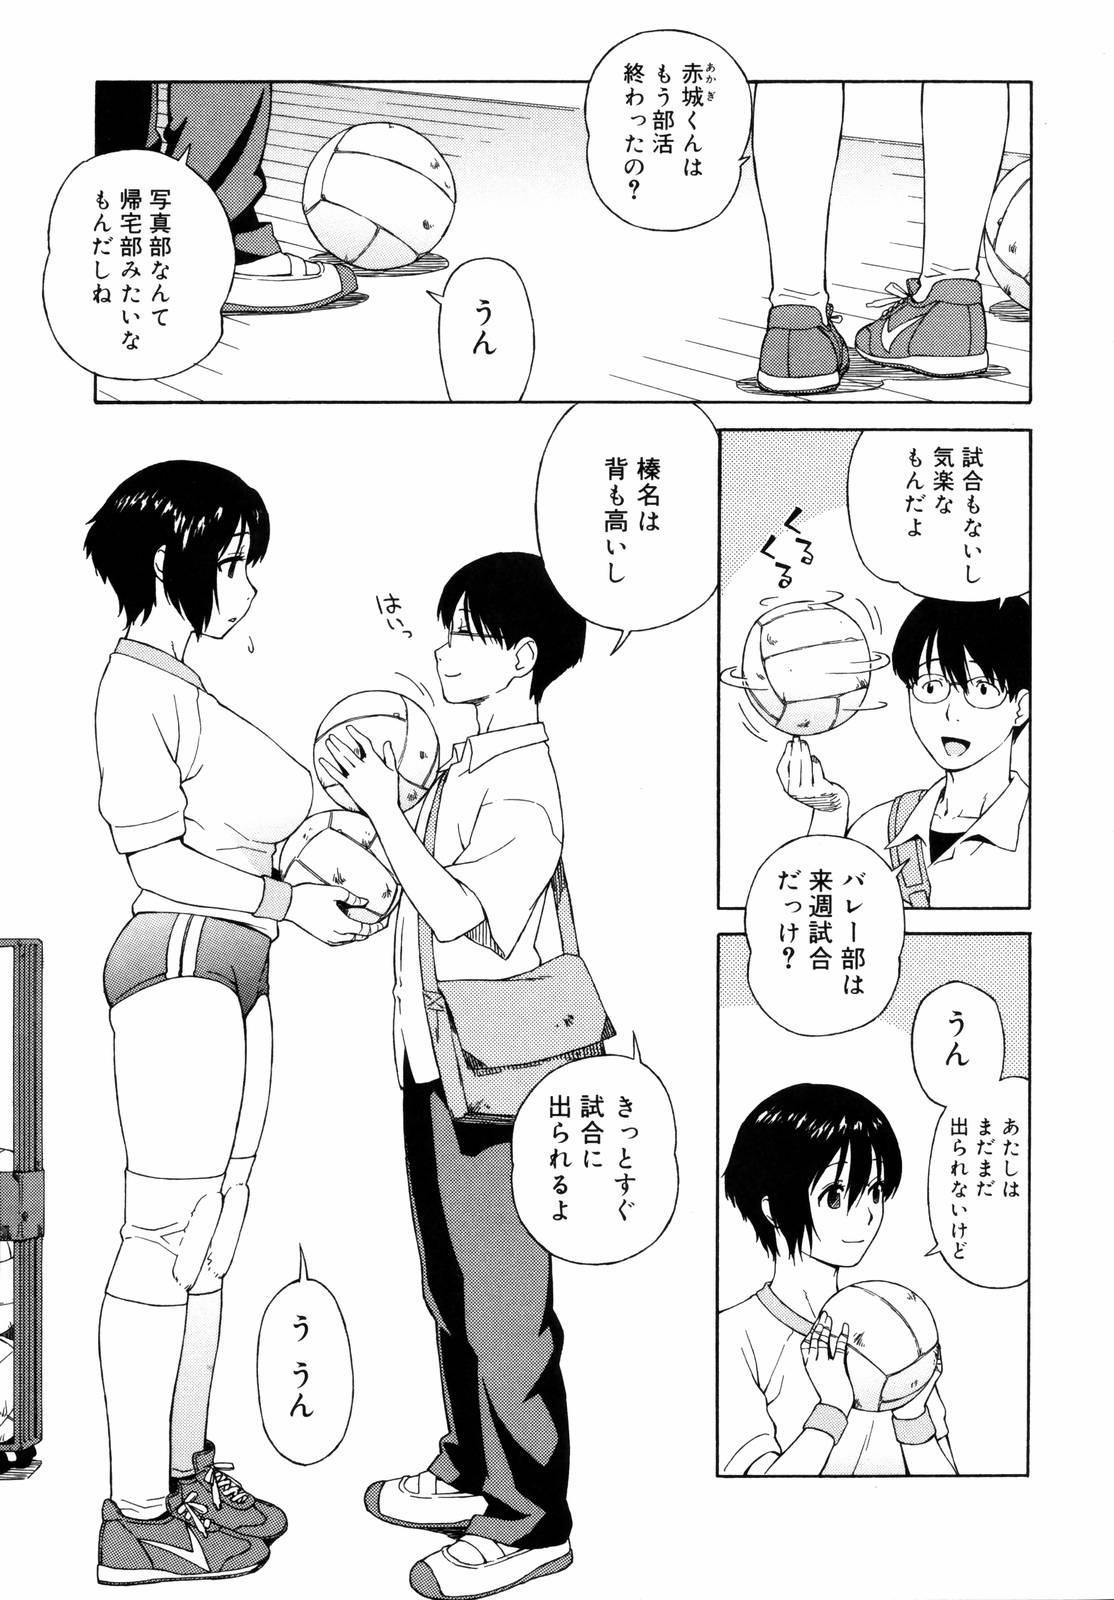 Shishunki wa Hatsujouki - Adolescence is a sexual excitement period. 8